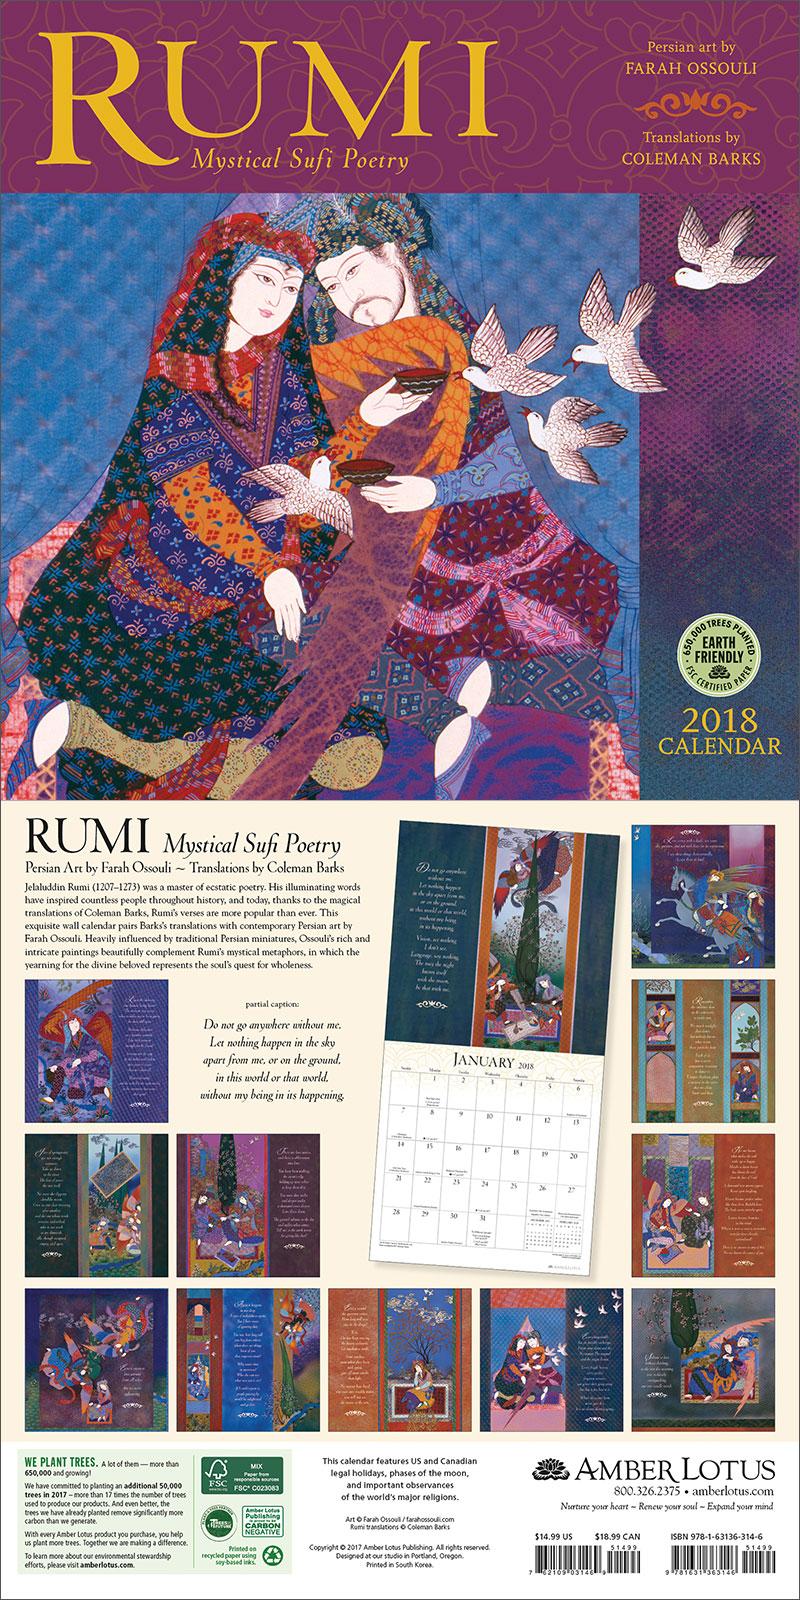 New 2018 Calendar Rumi Mystical Sufi Poetry Persian Art